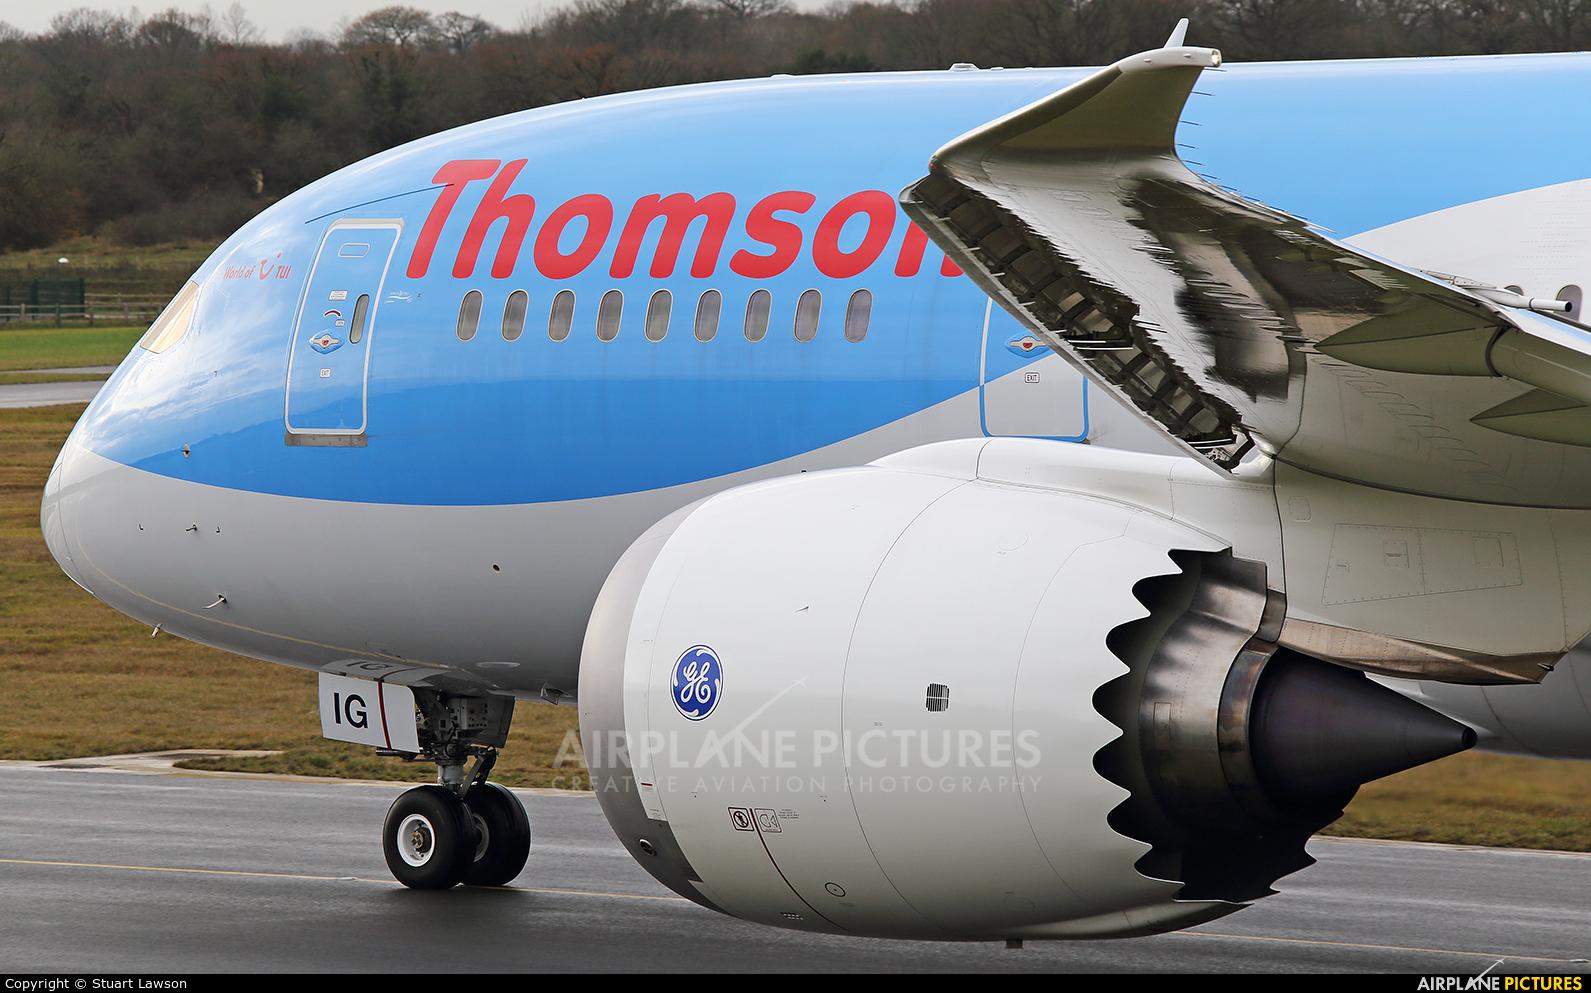 Thomson/Thomsonfly G-TUIG aircraft at Birmingham